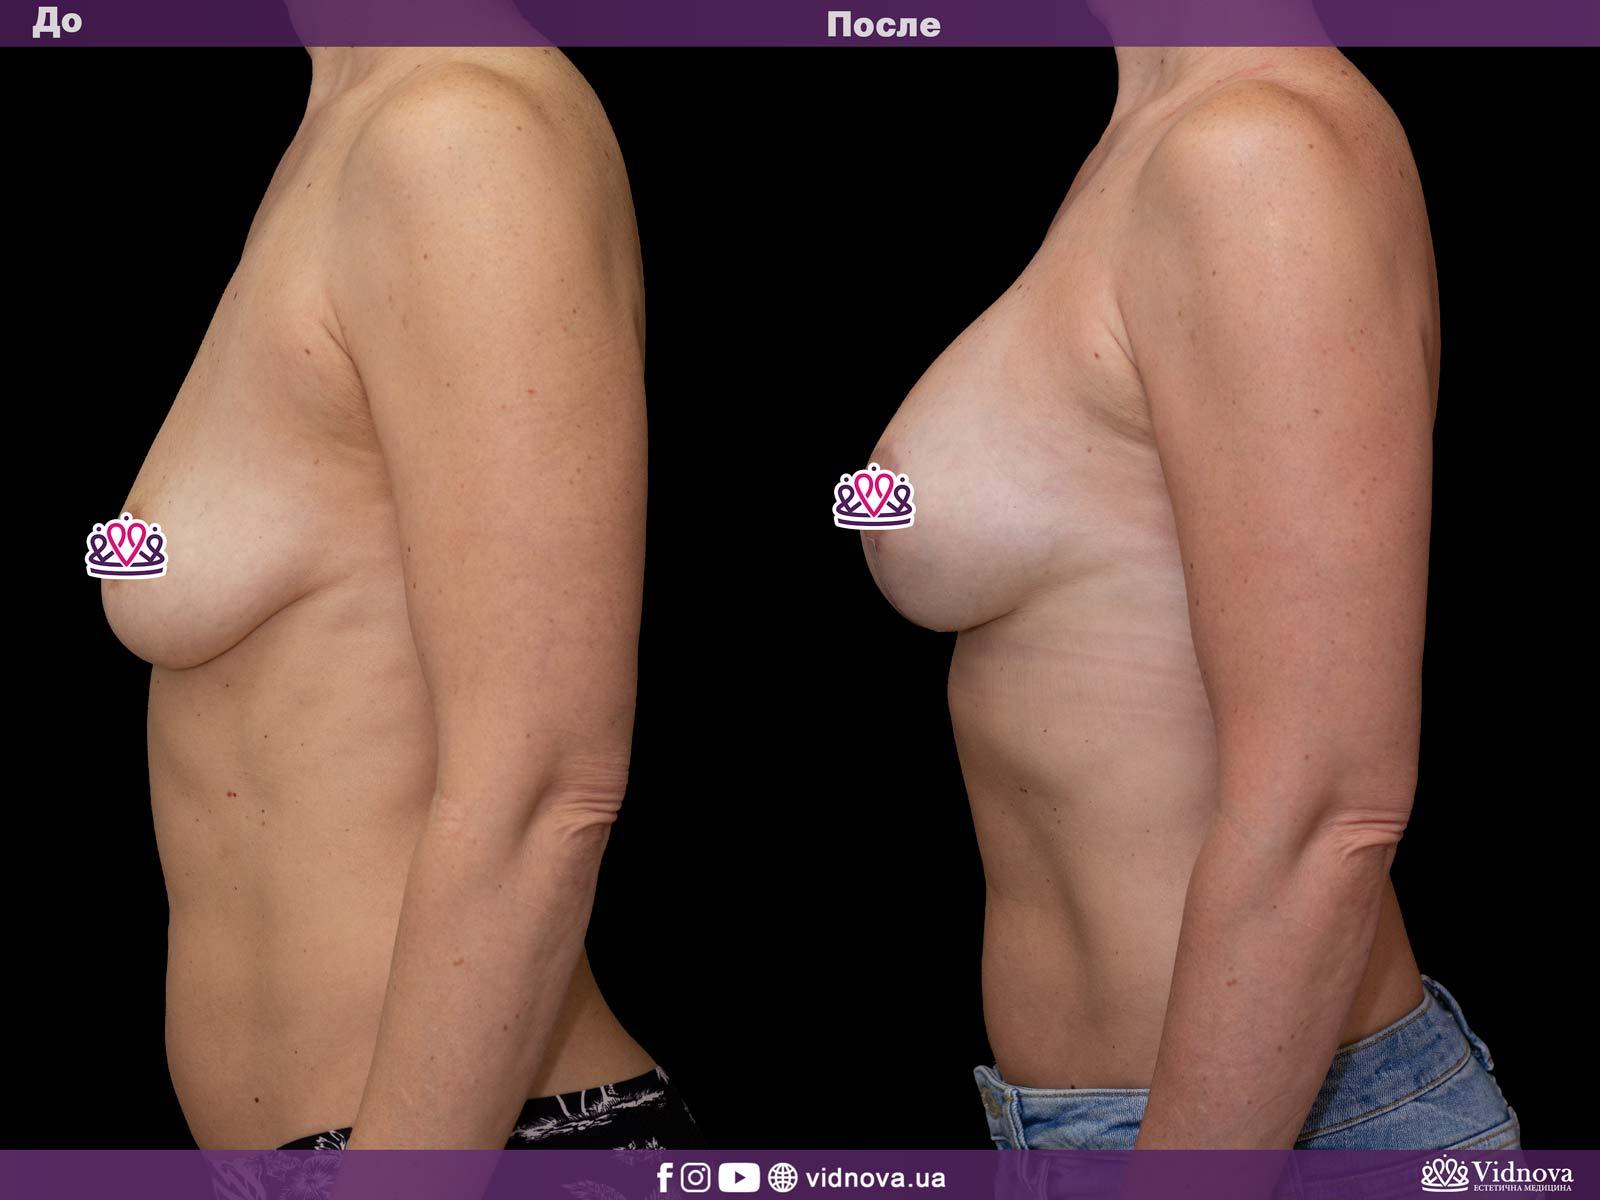 Подтяжка груди: Фото ДО и ПОСЛЕ - Пример №7-3 - Клиника Vidnova